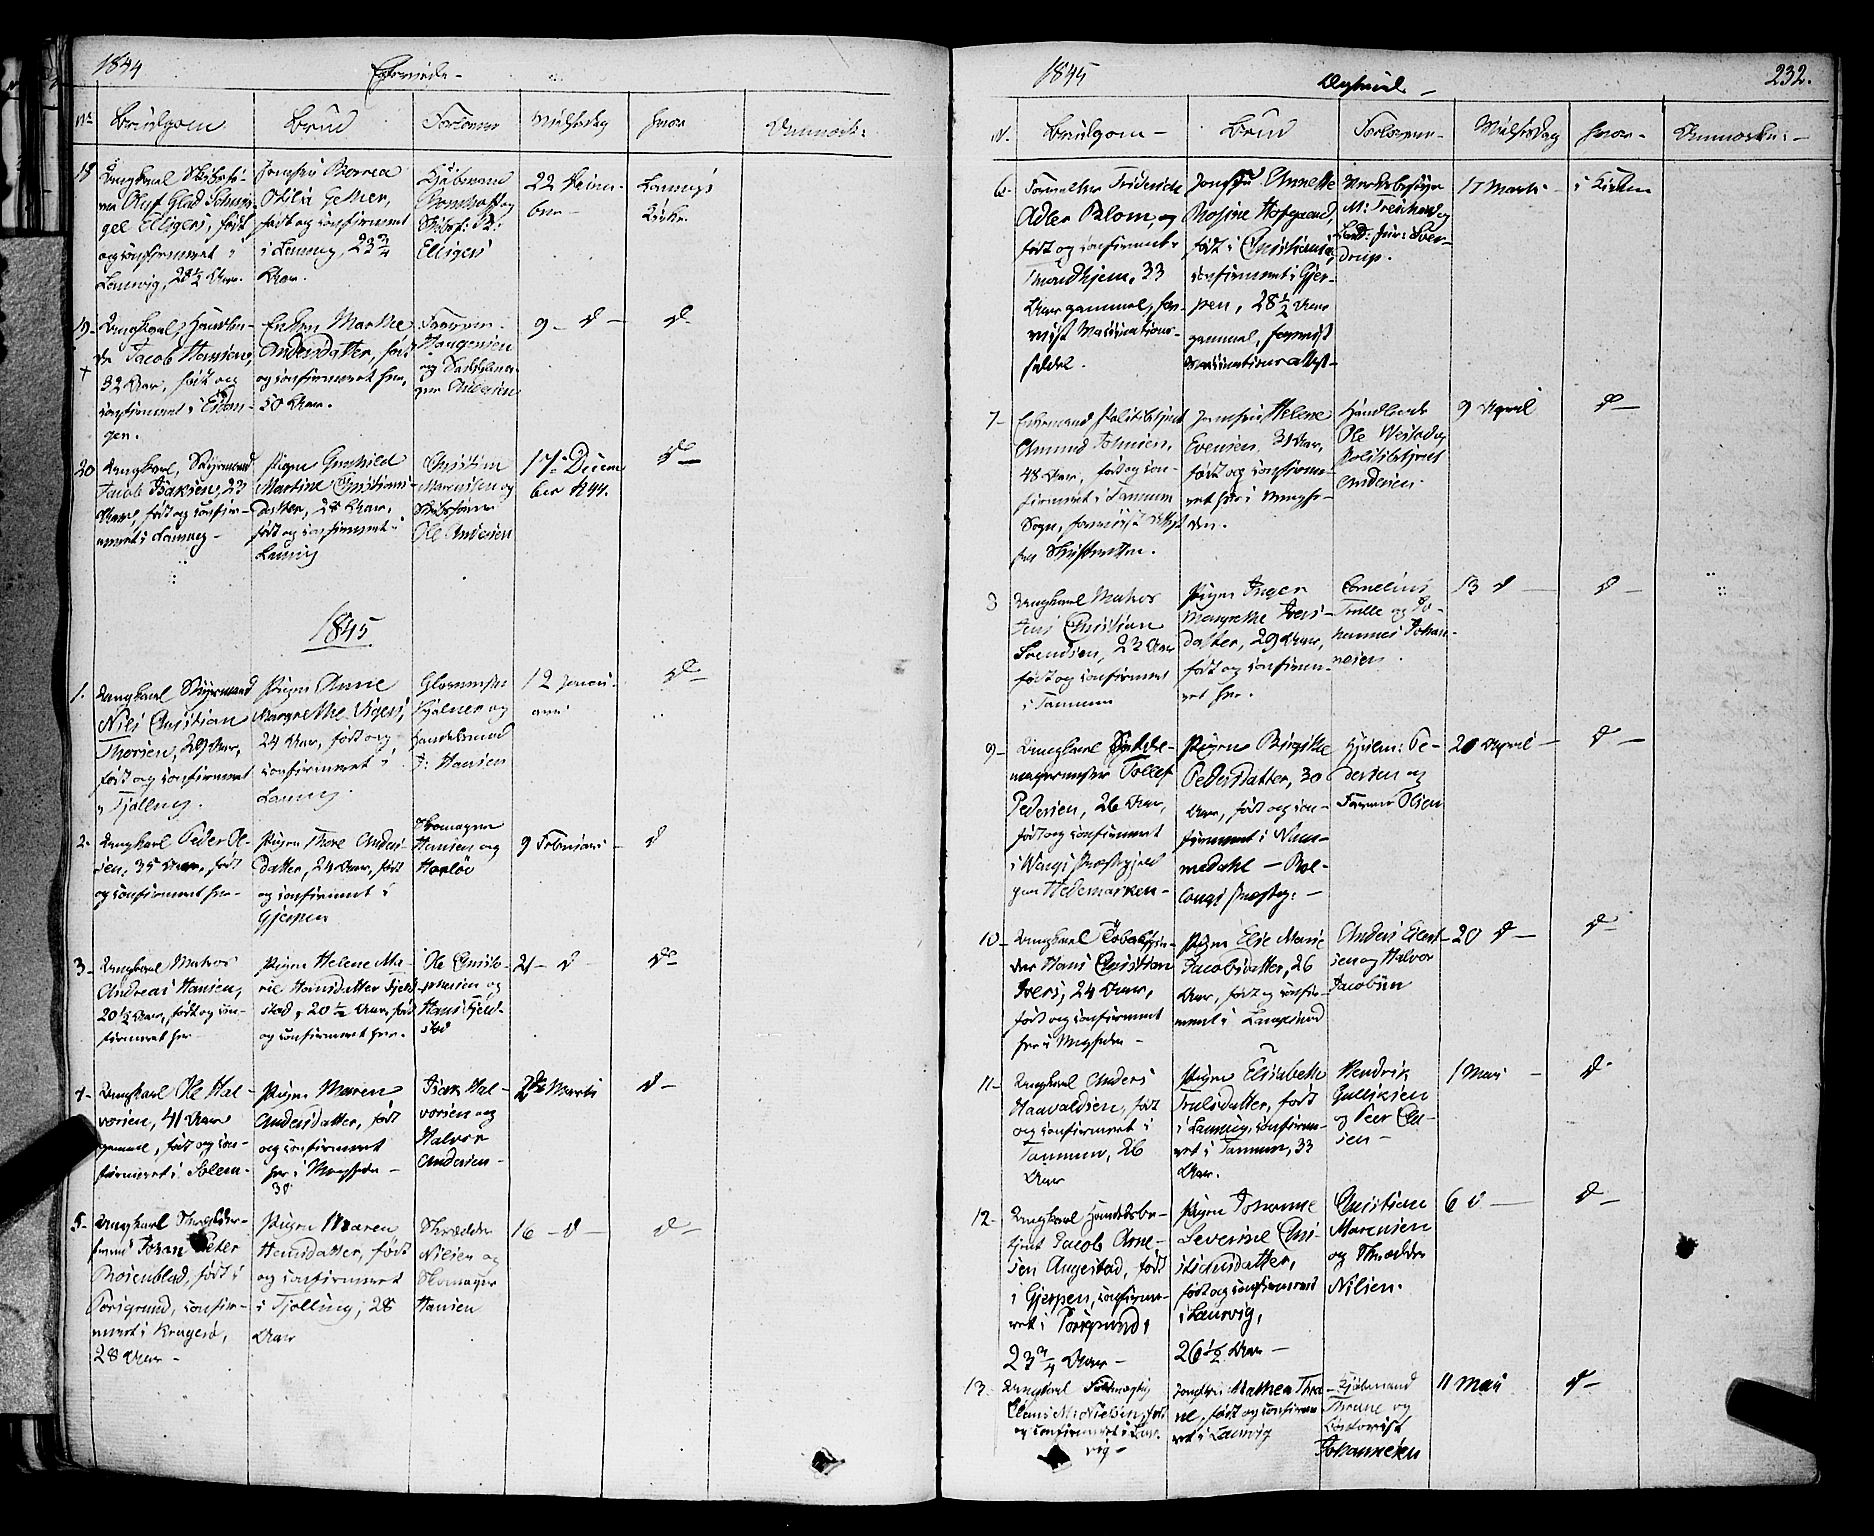 SAKO, Larvik kirkebøker, F/Fa/L0002: Ministerialbok nr. I 2, 1825-1847, s. 232